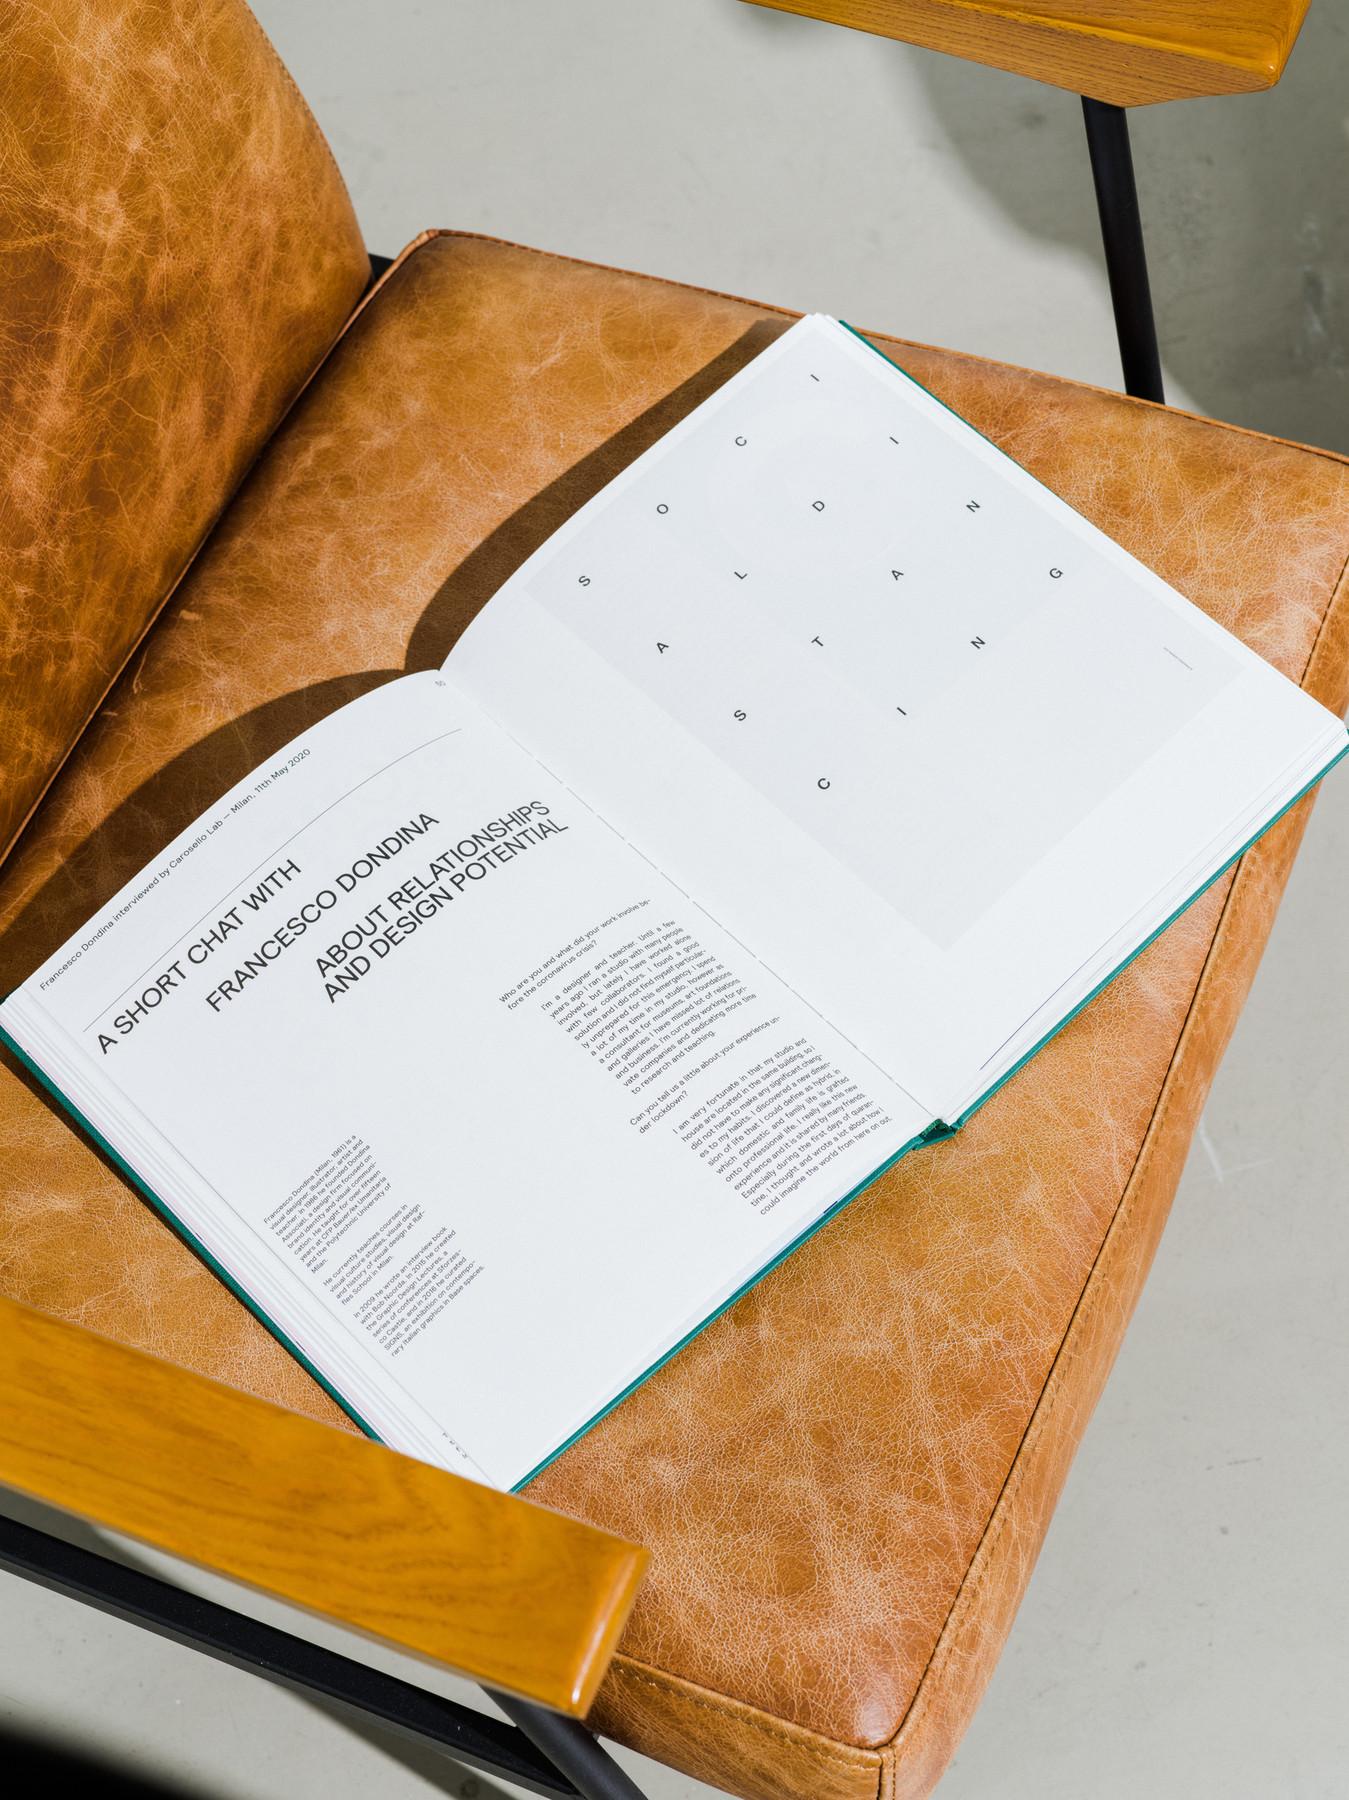 DAC Book CaroselloLab 040